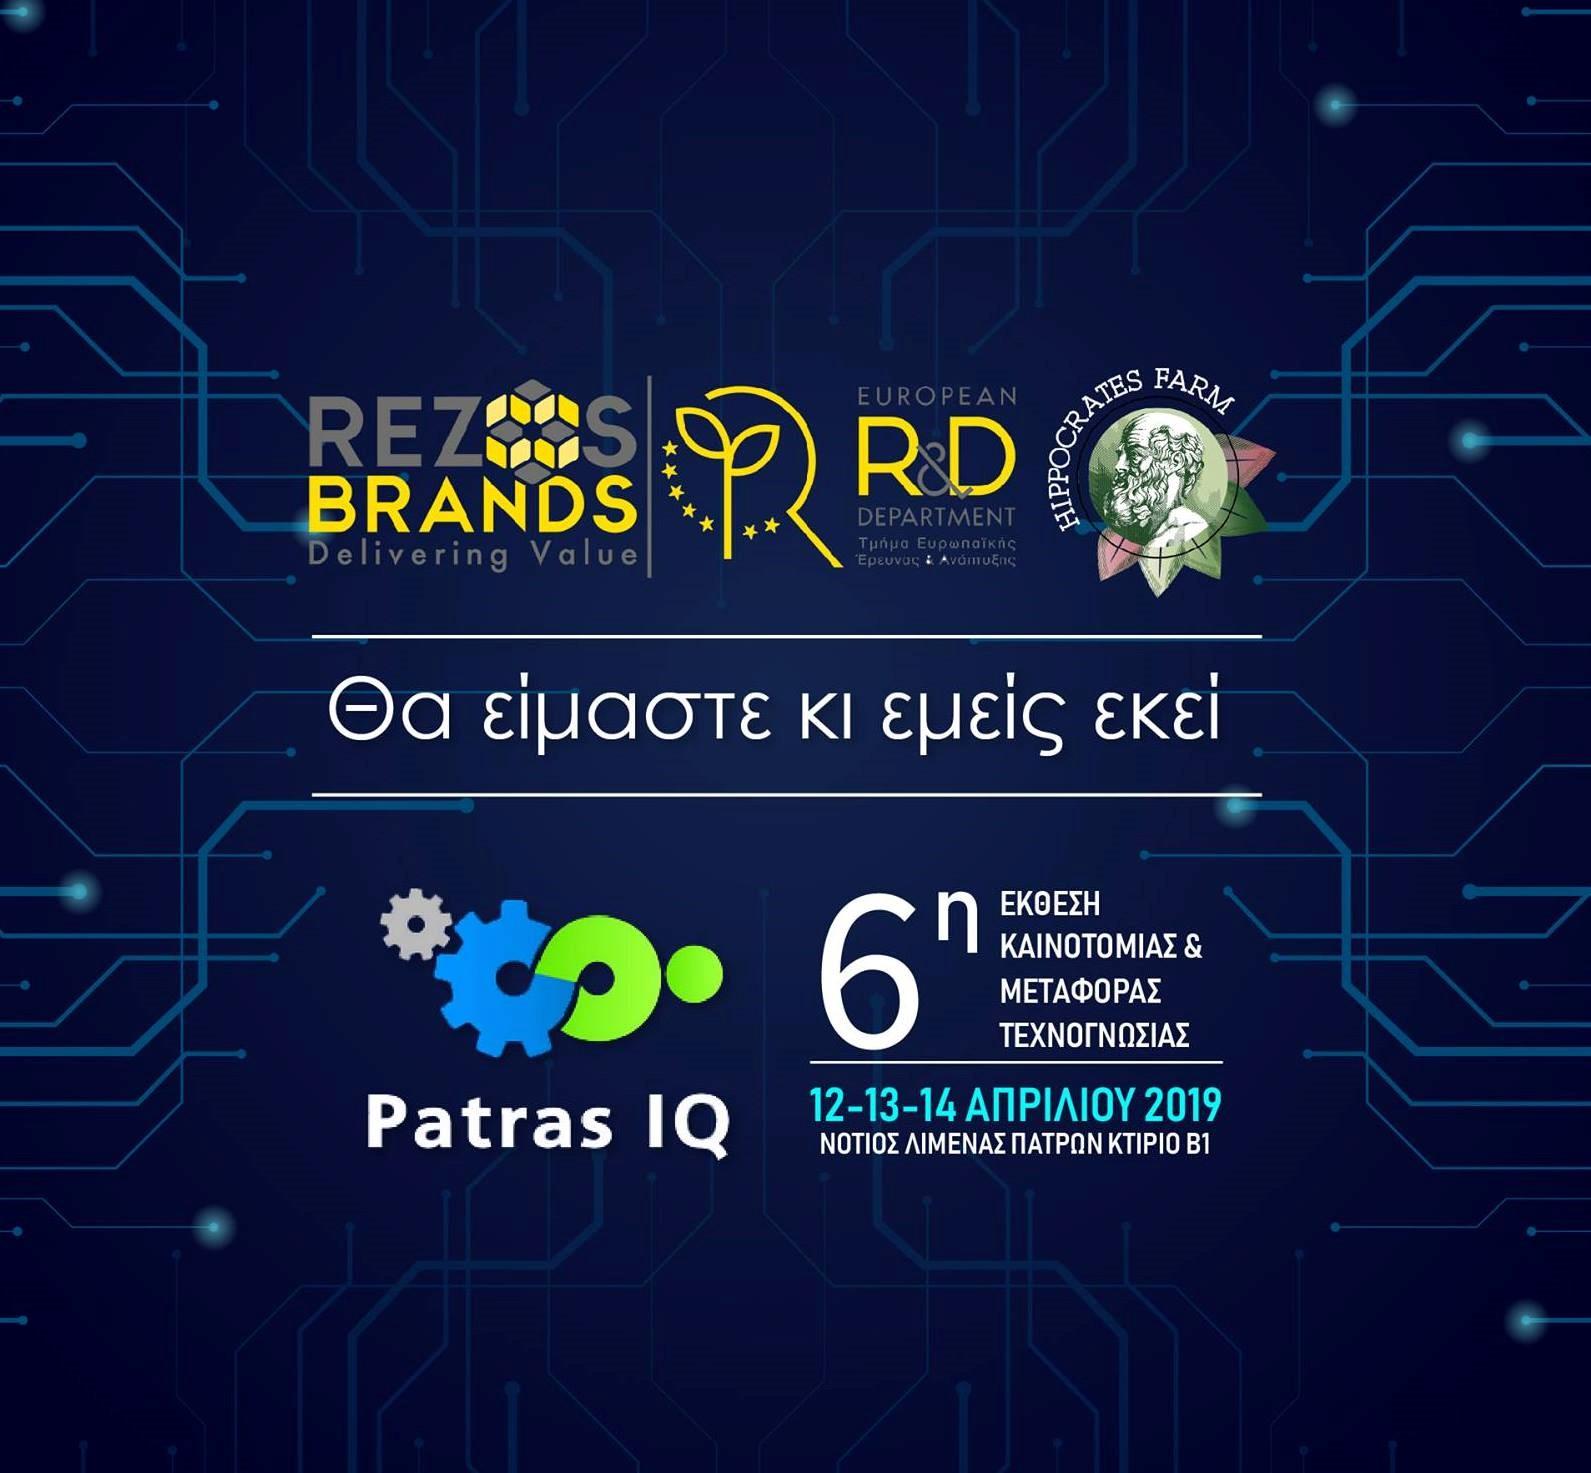 REZOS BRANDS on PATRAS IQ